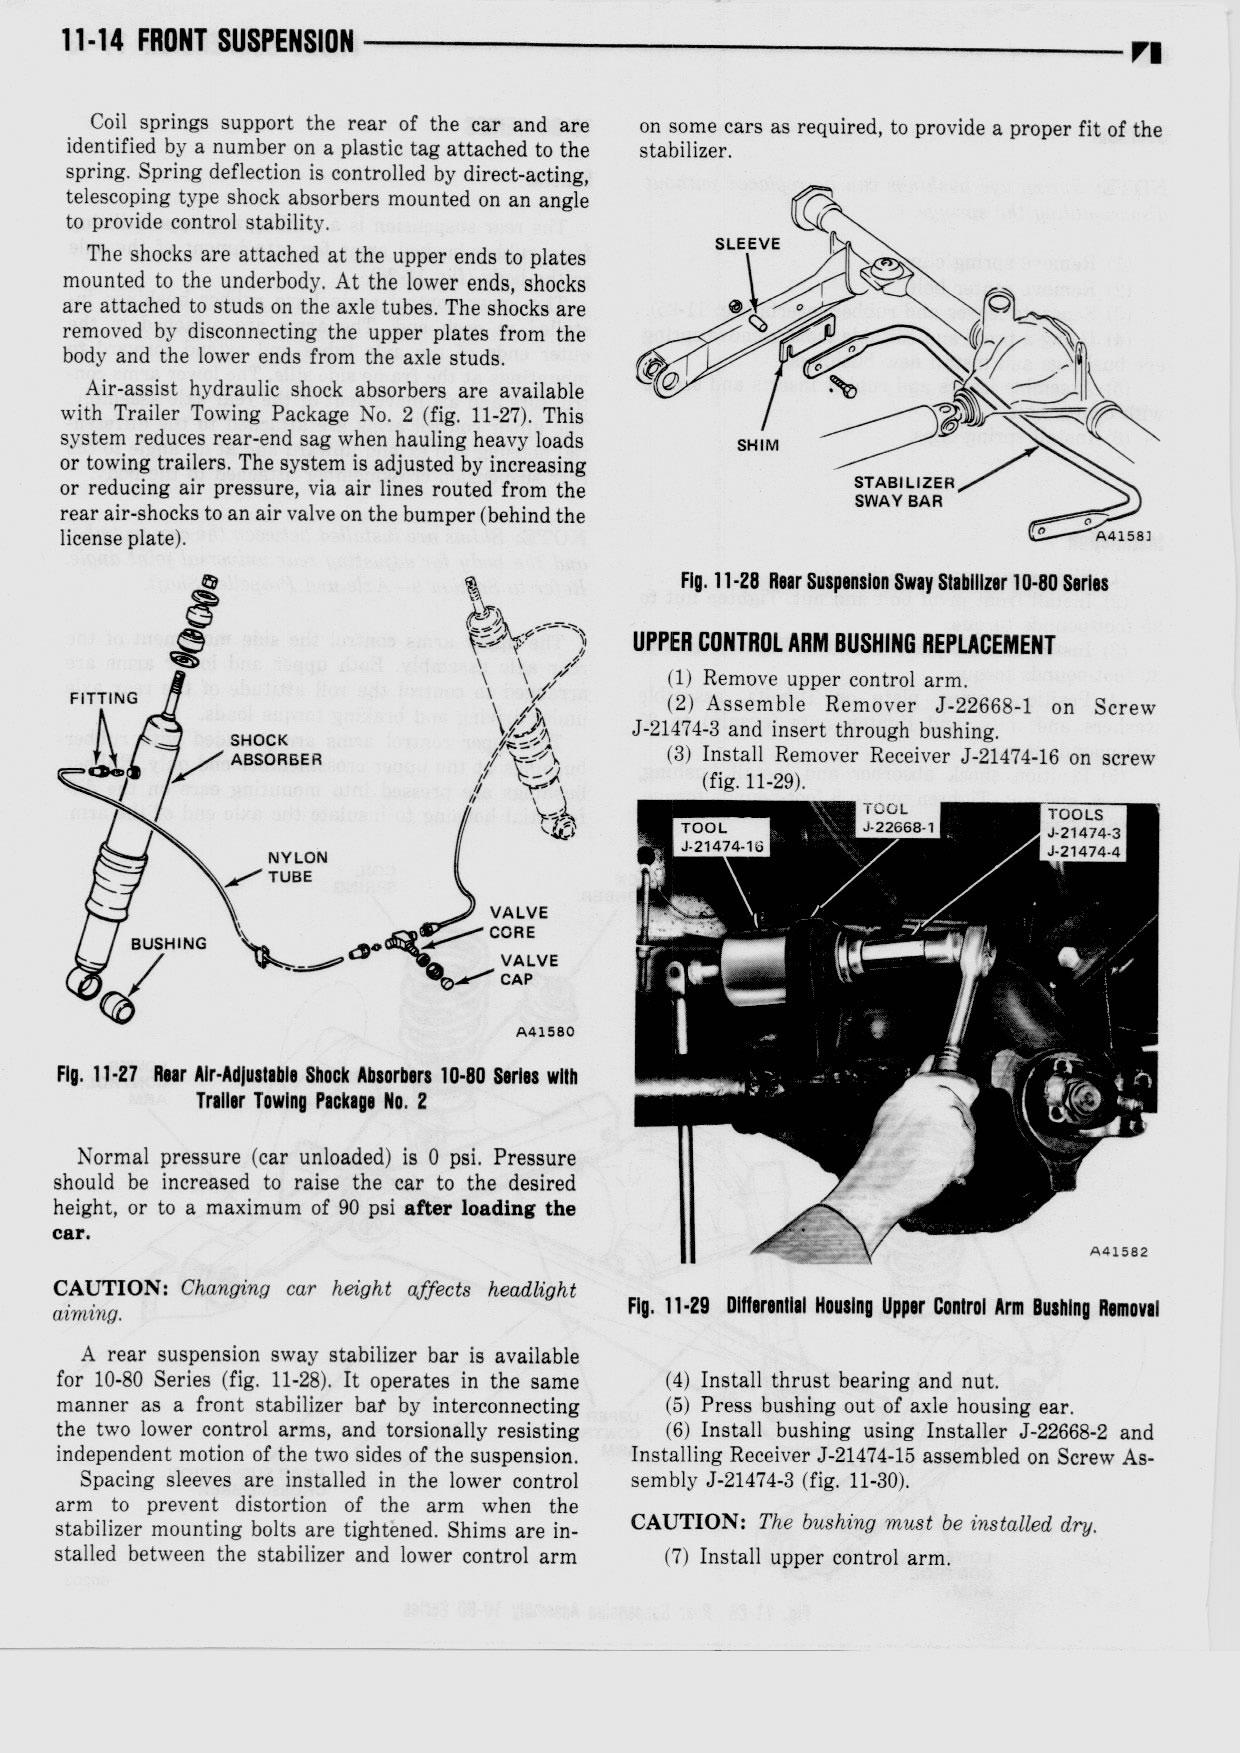 11 Suspension / 1976 AMC Technical Service Manual_Page_652.jpg